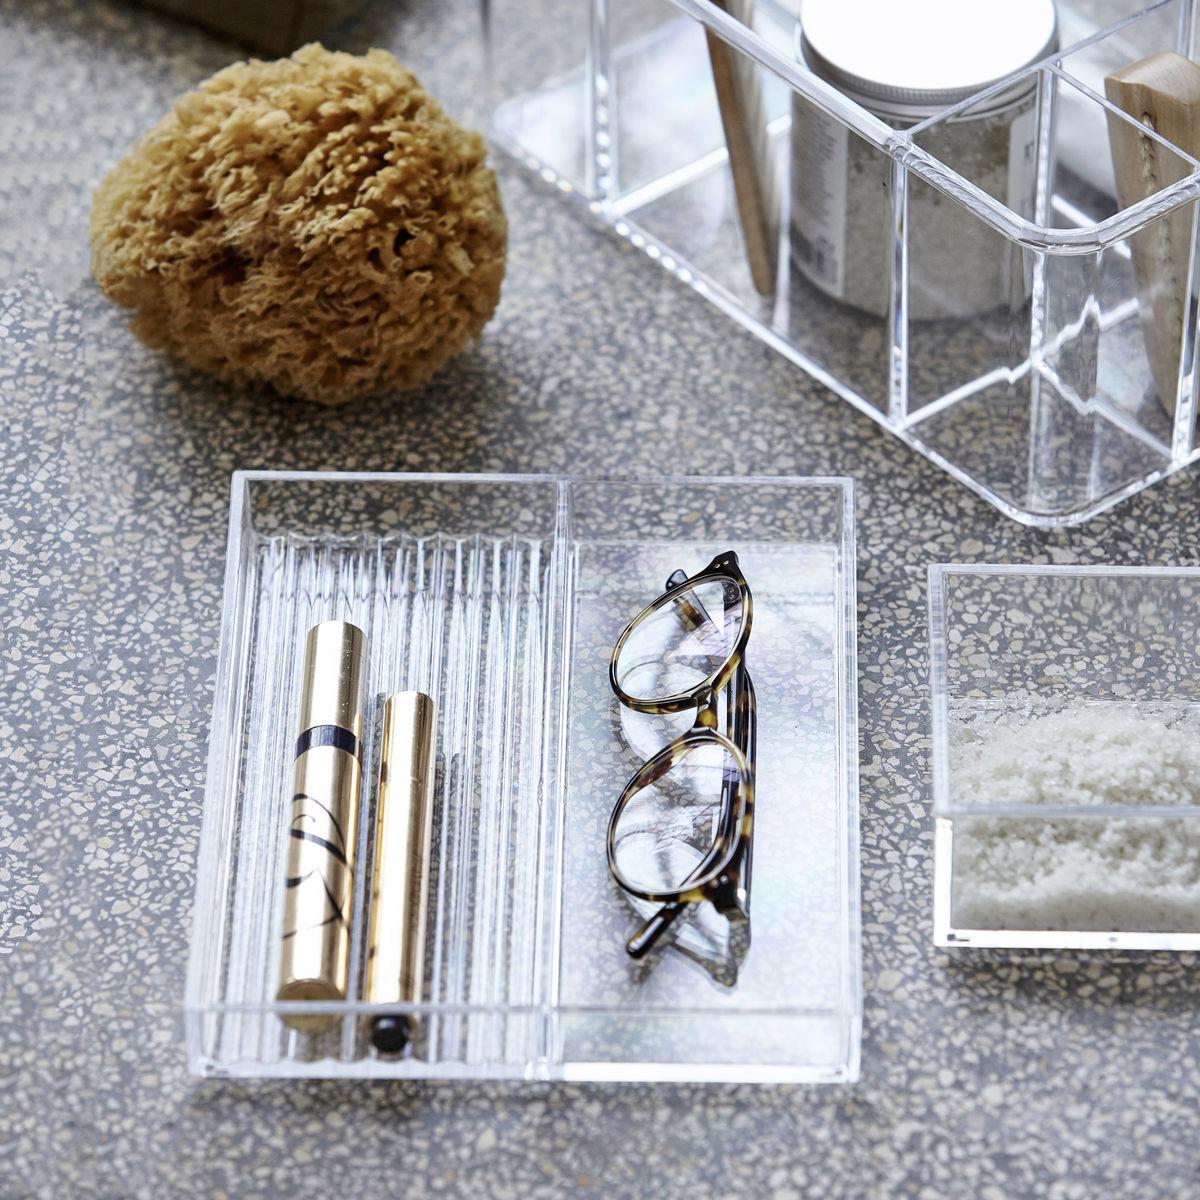 Bakke-akryl-klar-paa-badevarelset